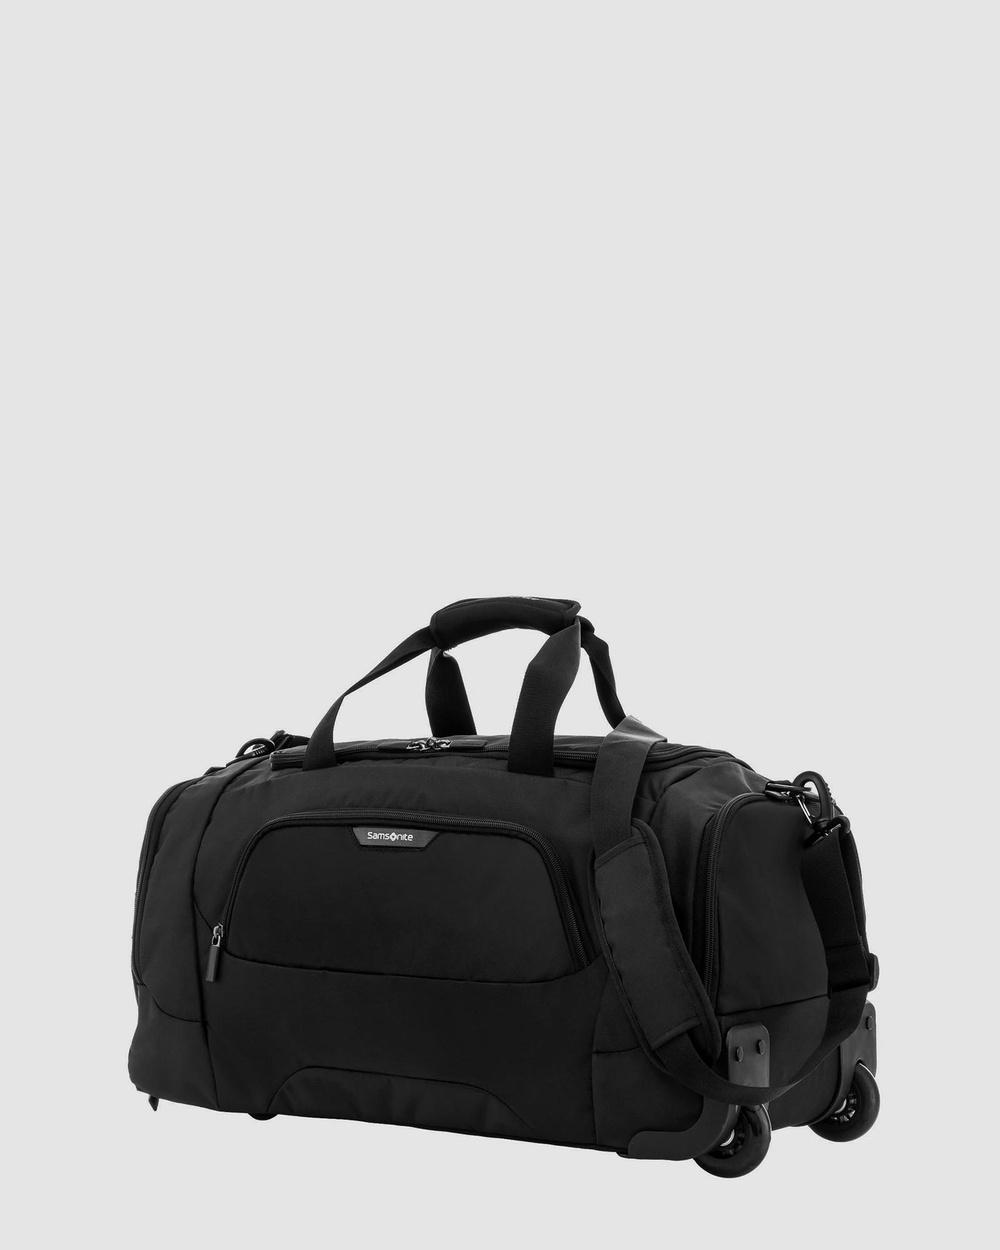 Samsonite Business Albi 55cm On Wheel Duffle Bag Bags Black & Grey On-Wheel